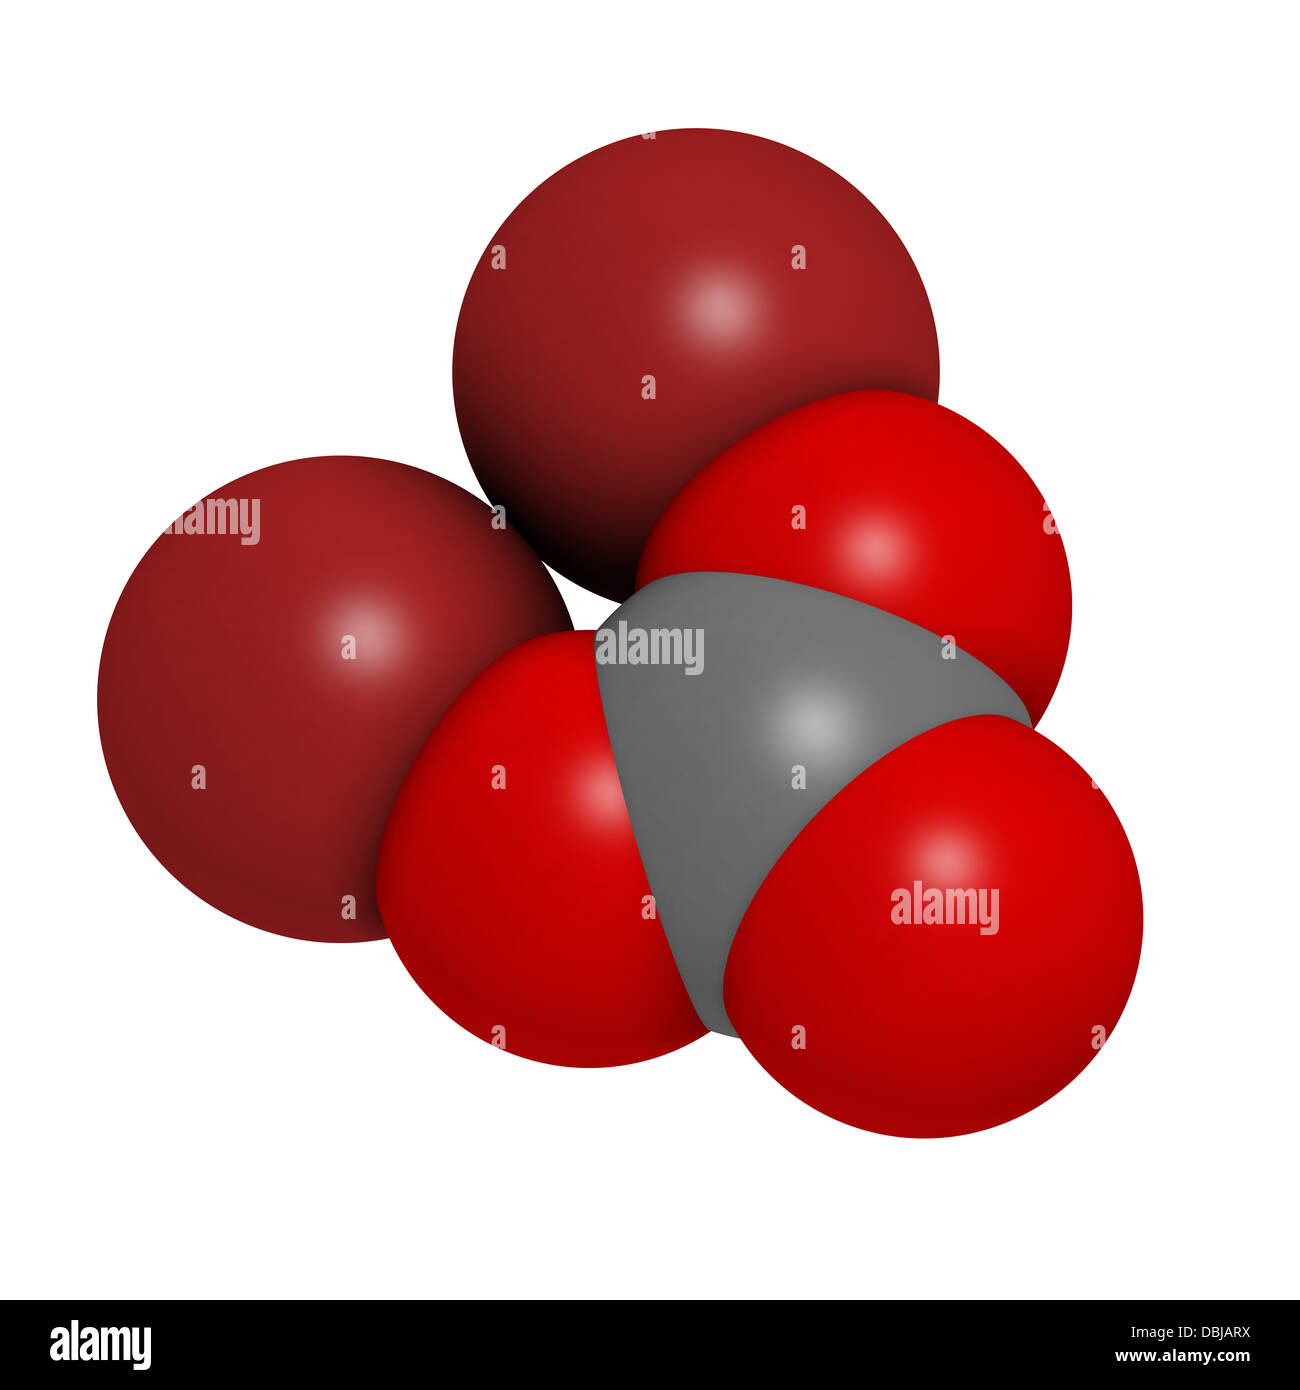 Lithium carbonate (Li2CO3) bipolar disorder drug, chemical structure. - Stock Image